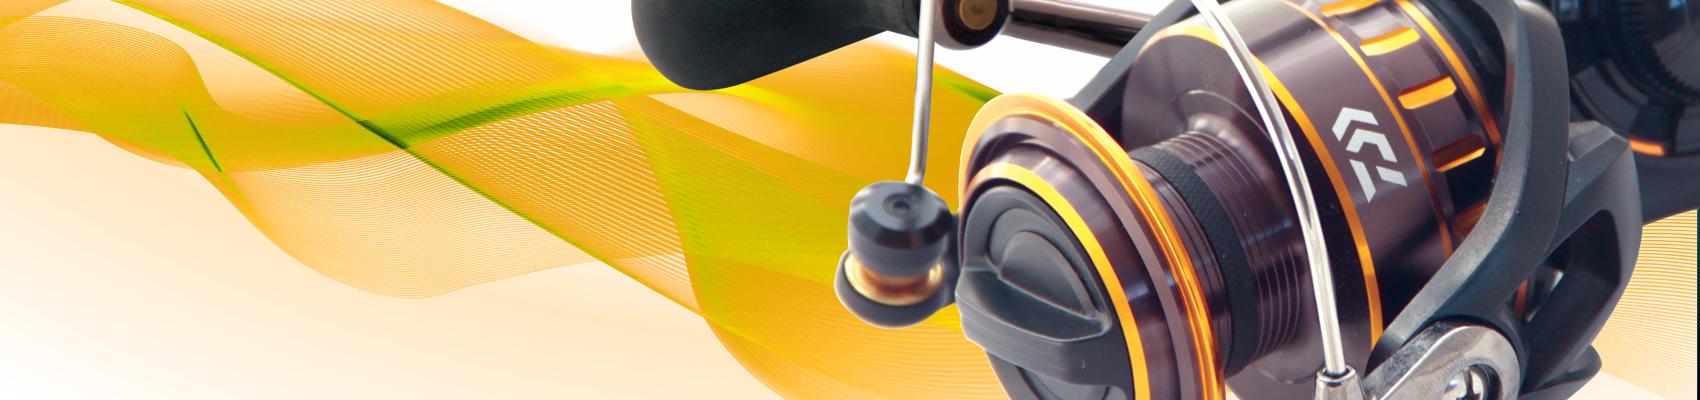 main-banner-new-prod-blackgoldspinning